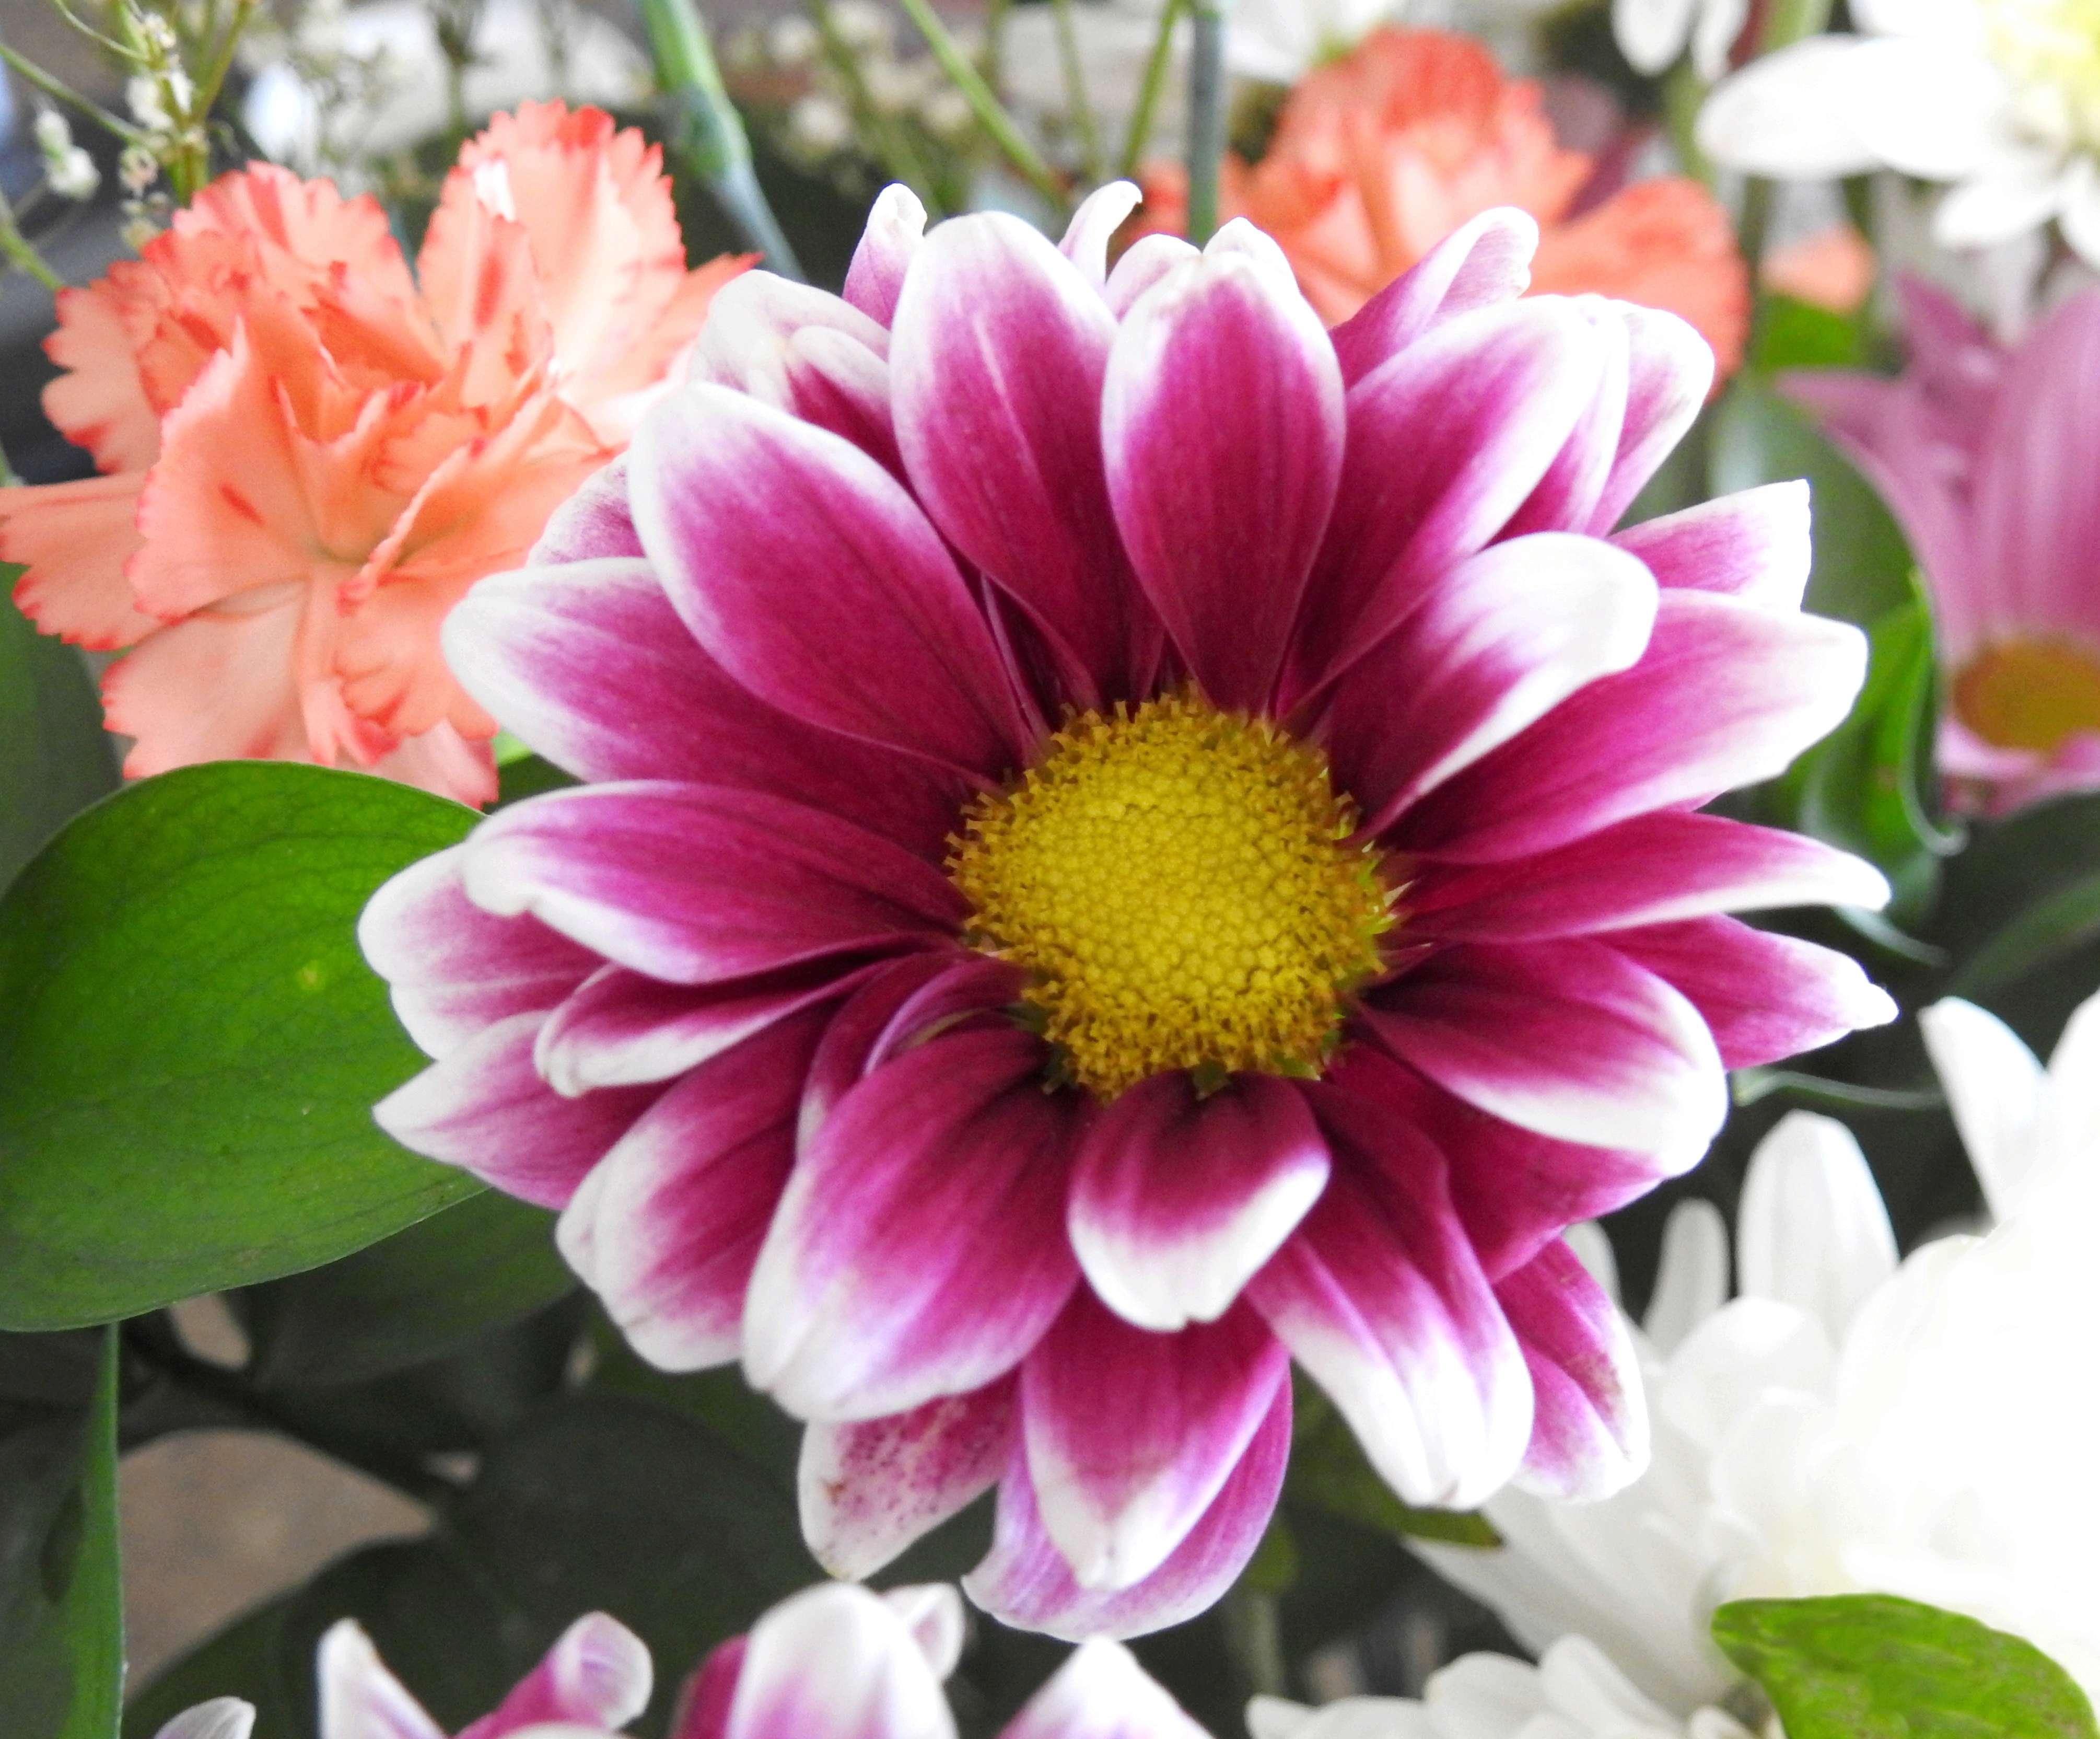 [Fil Ouvert] Fleurs - Page 21 2018-071